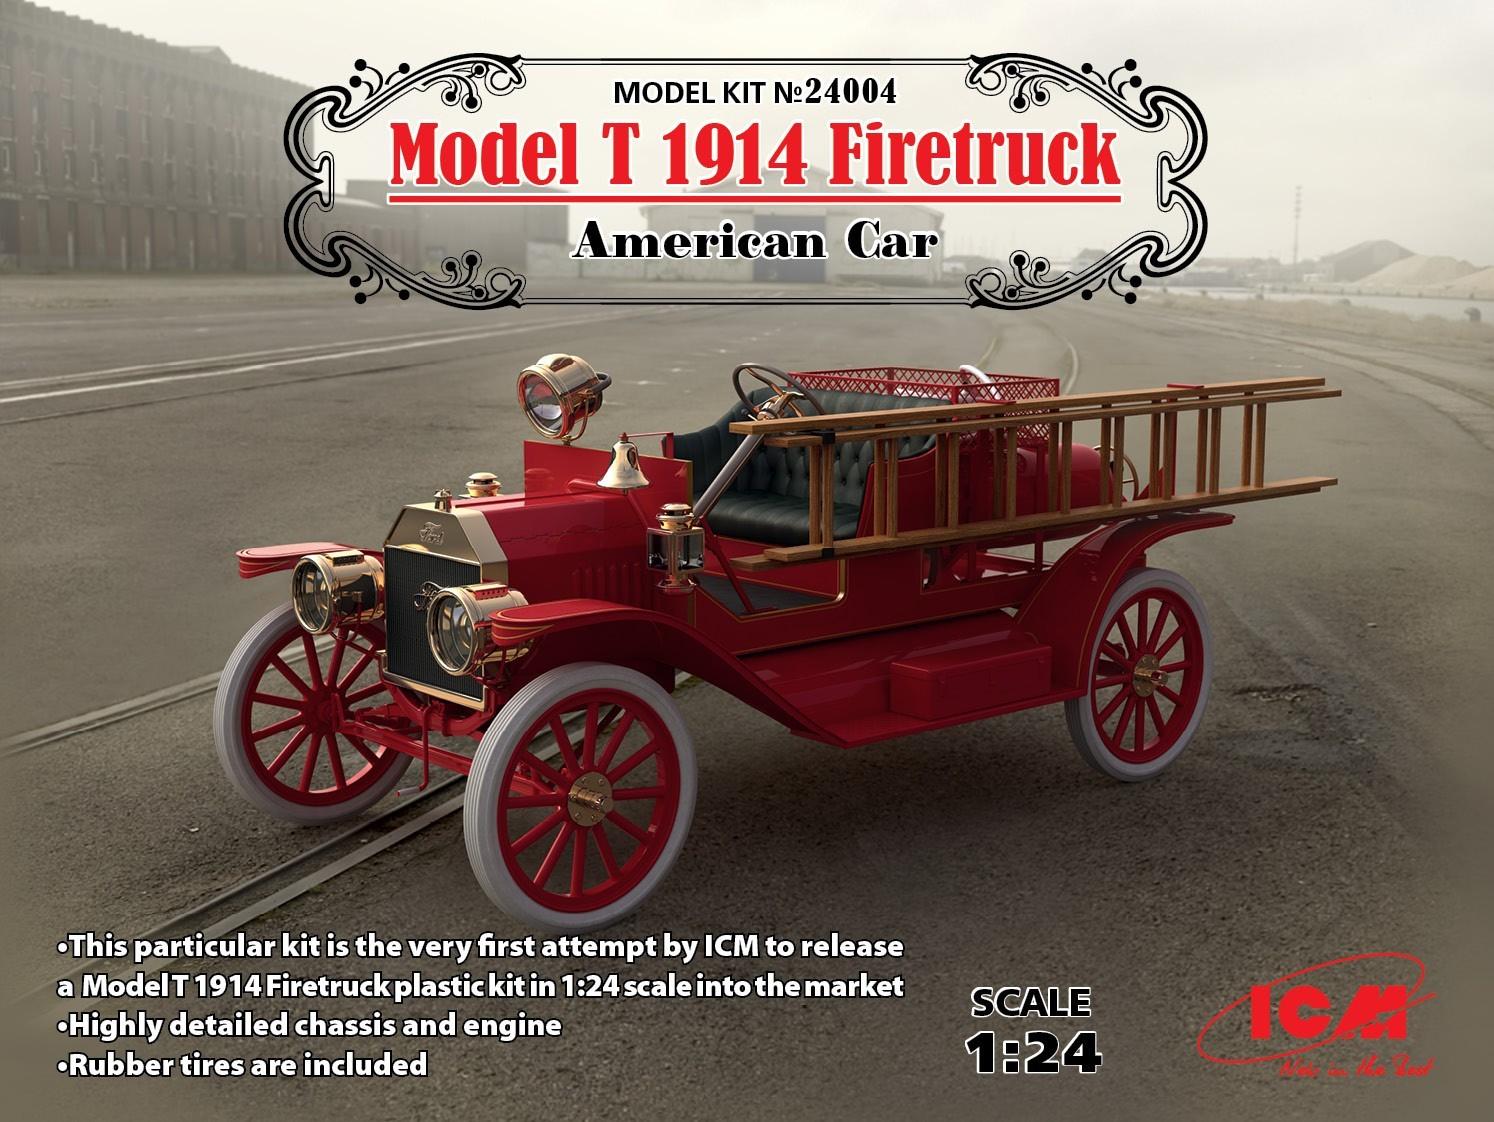 Model T 1914 Firetruck, American Car (100% new moulds)